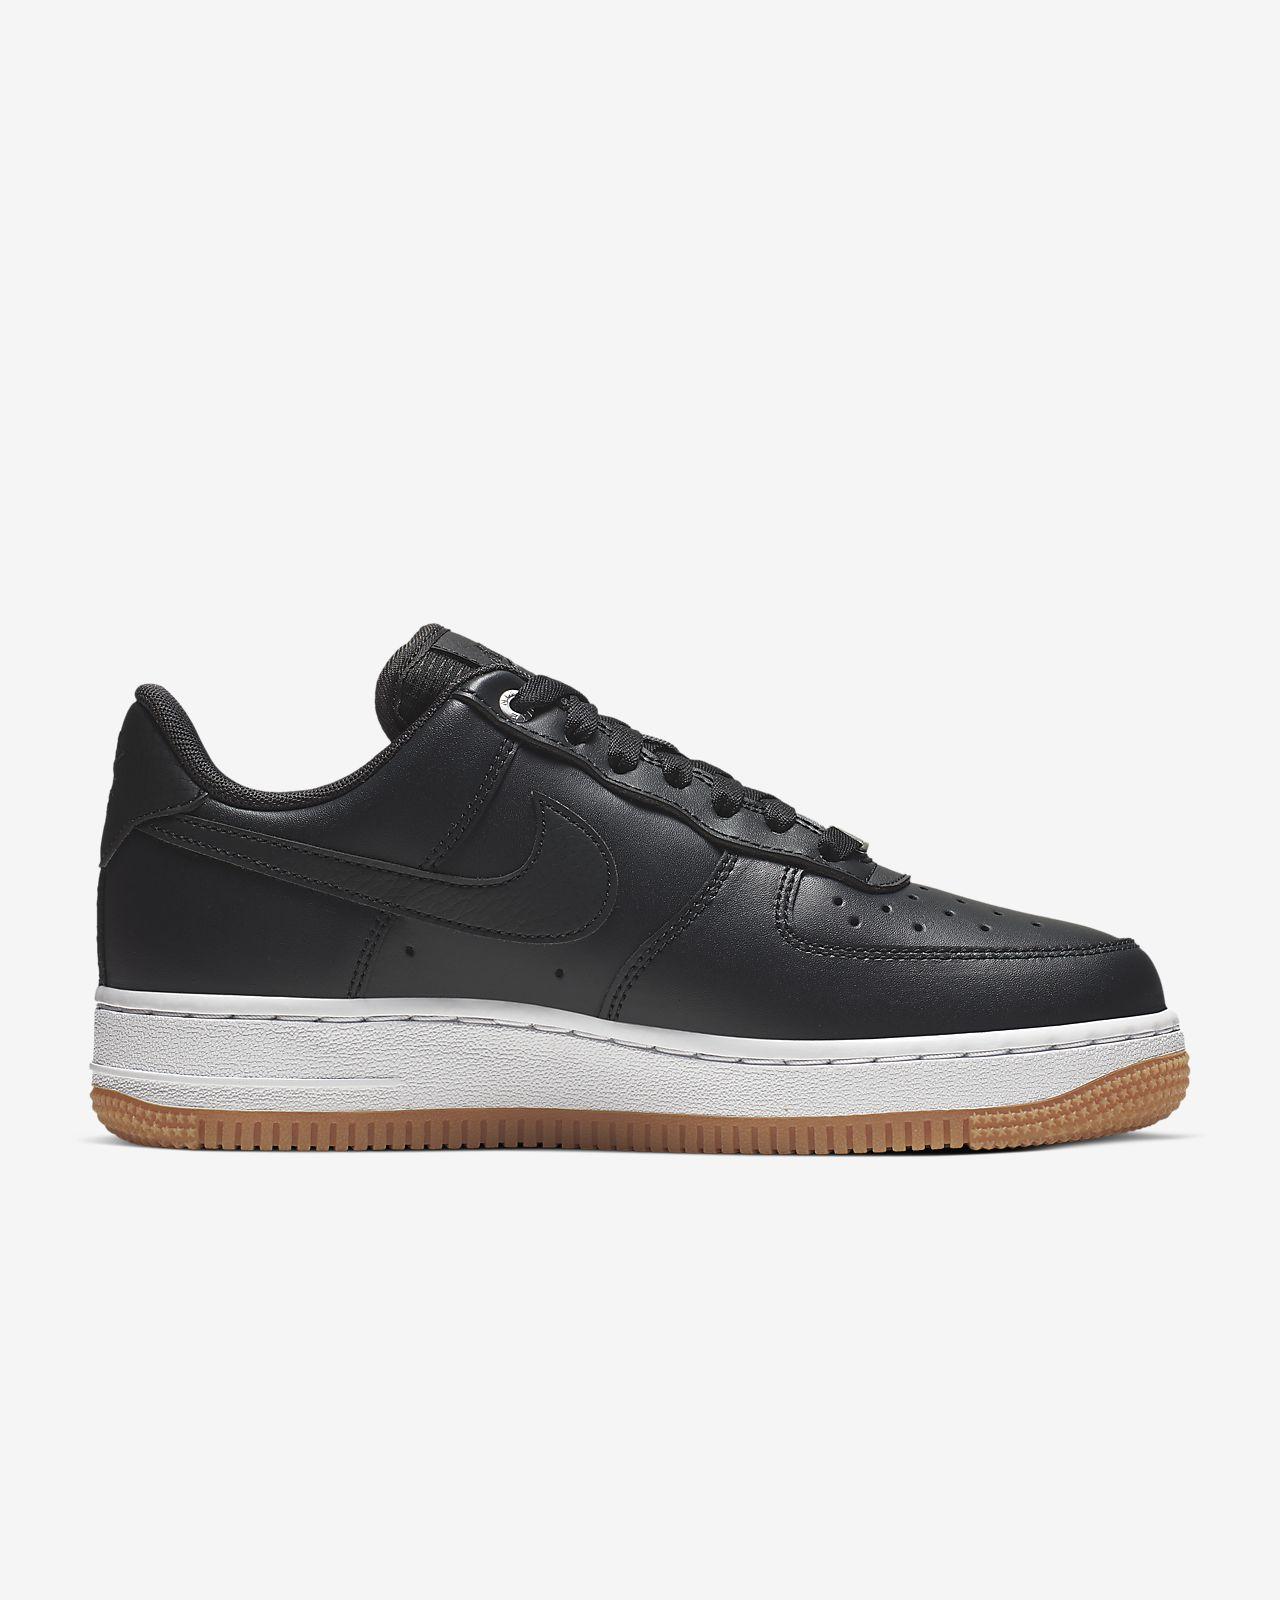 Chaussure Nike Air Force 1 '07 Low Premium pour Femme